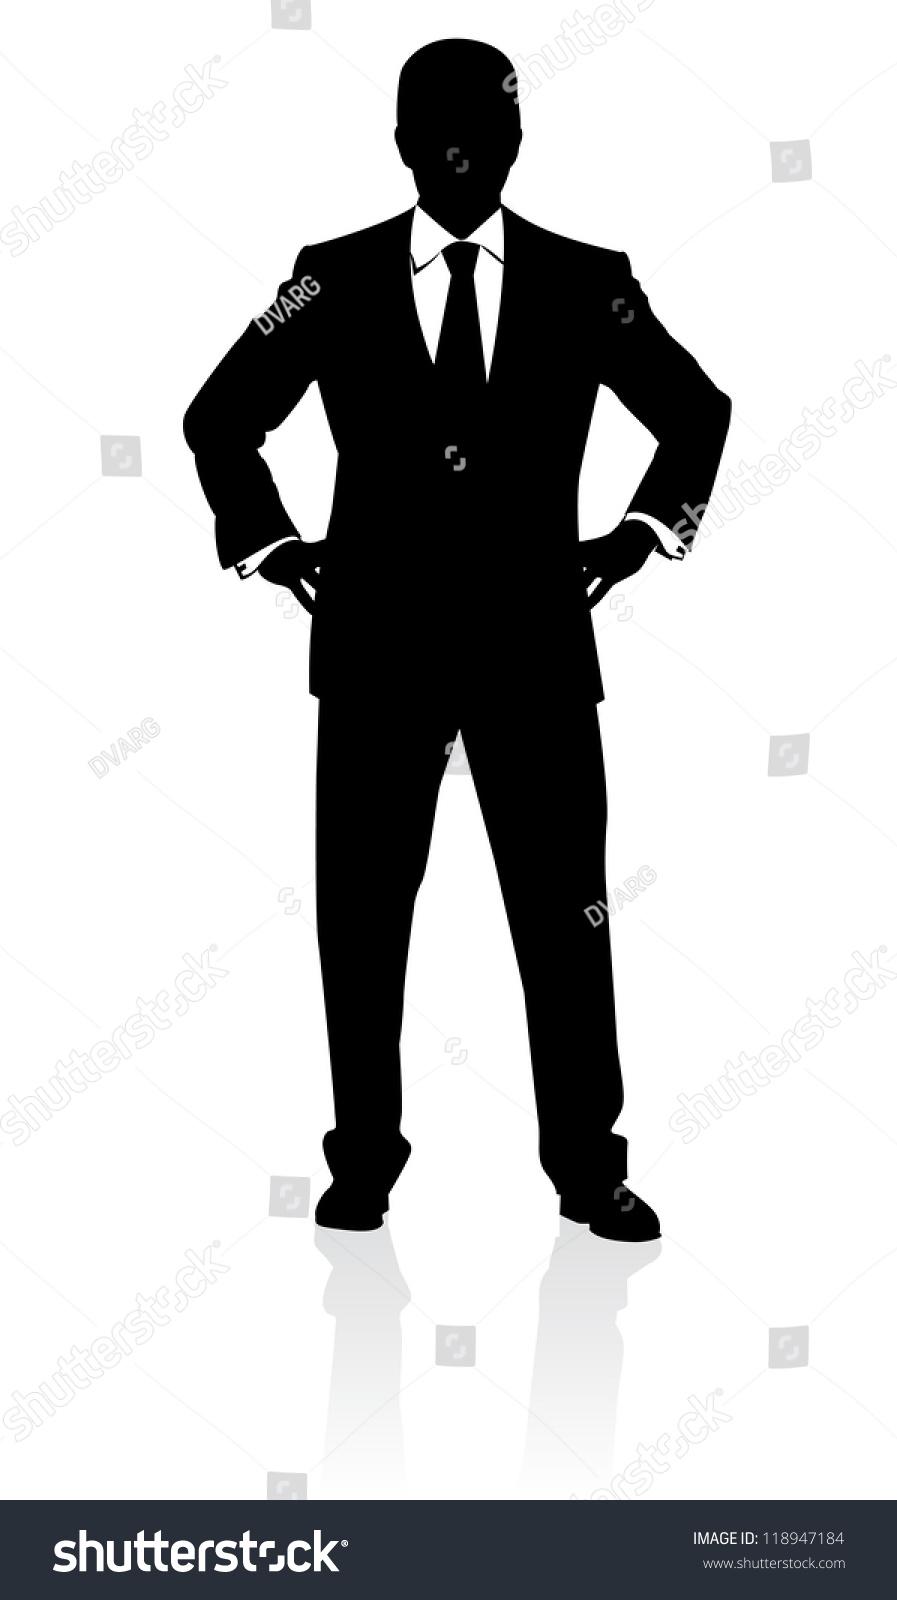 raster version business man suit tie stock illustration